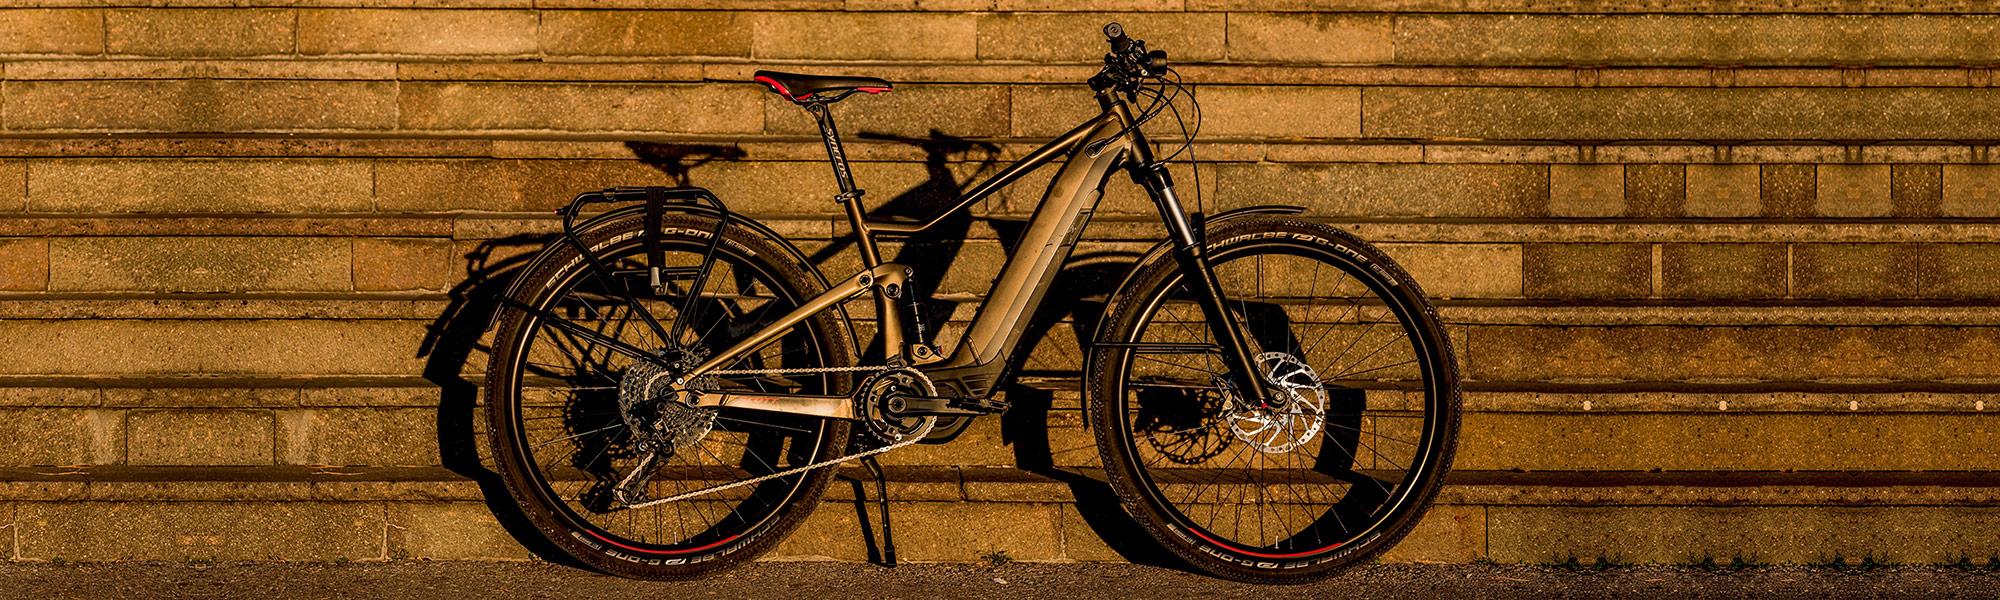 Zweirad-Fuhr-E-Bike-Ebike-Testen